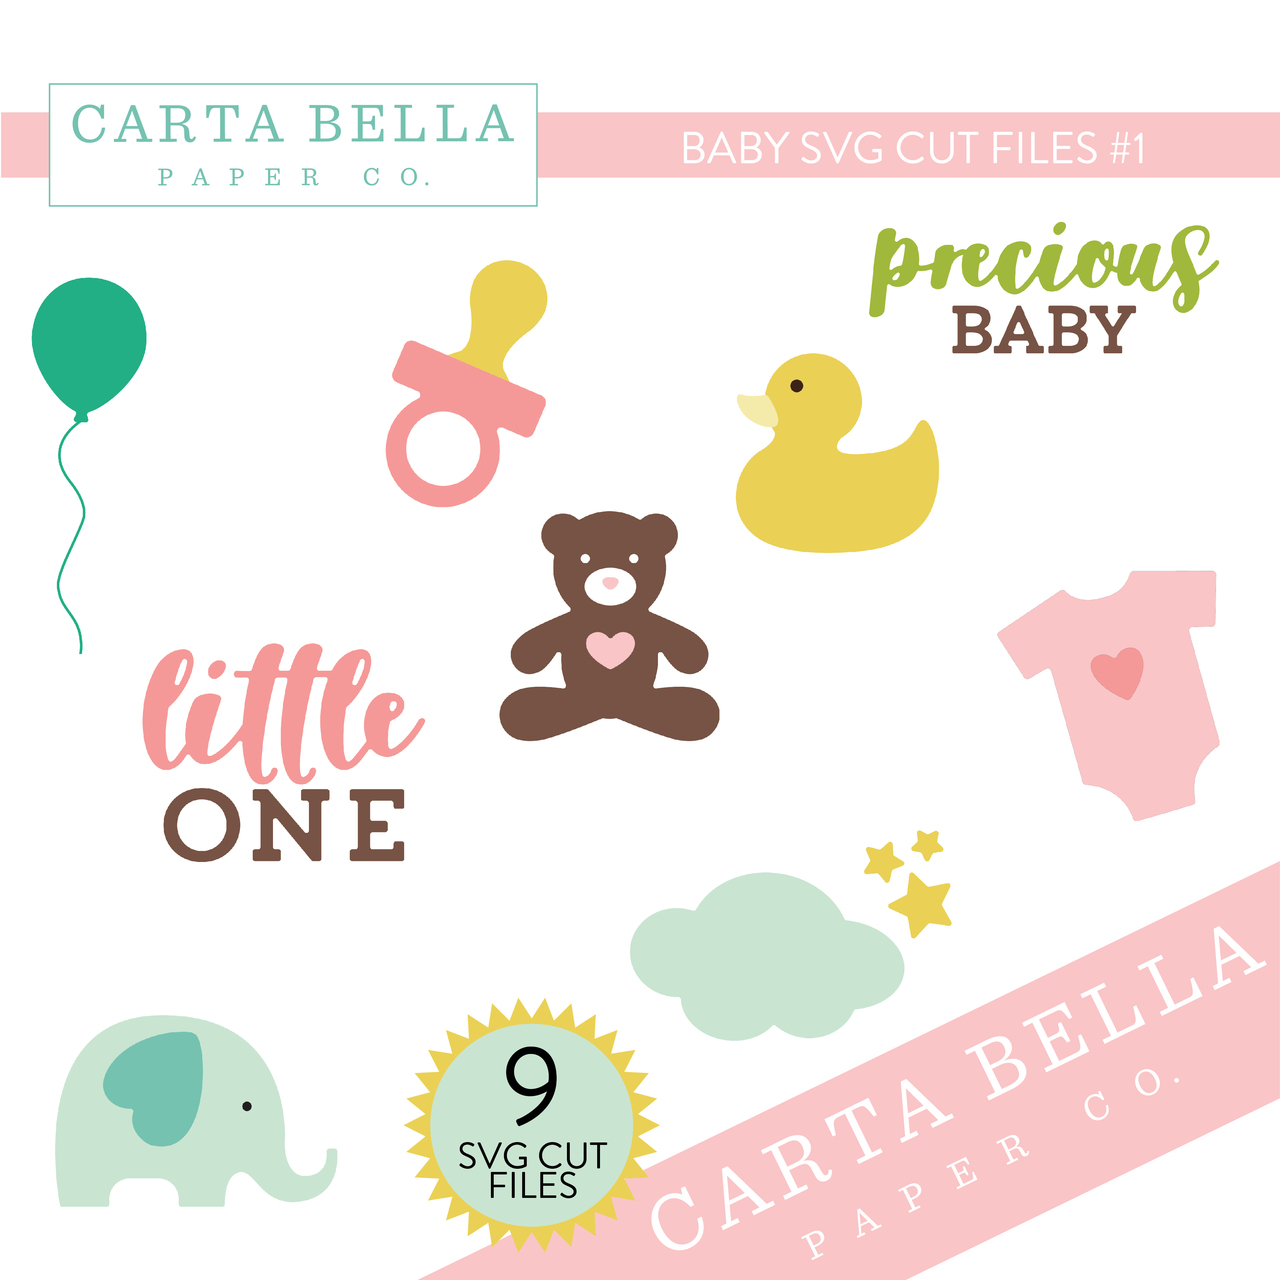 CB Baby SVG Cut Files #1